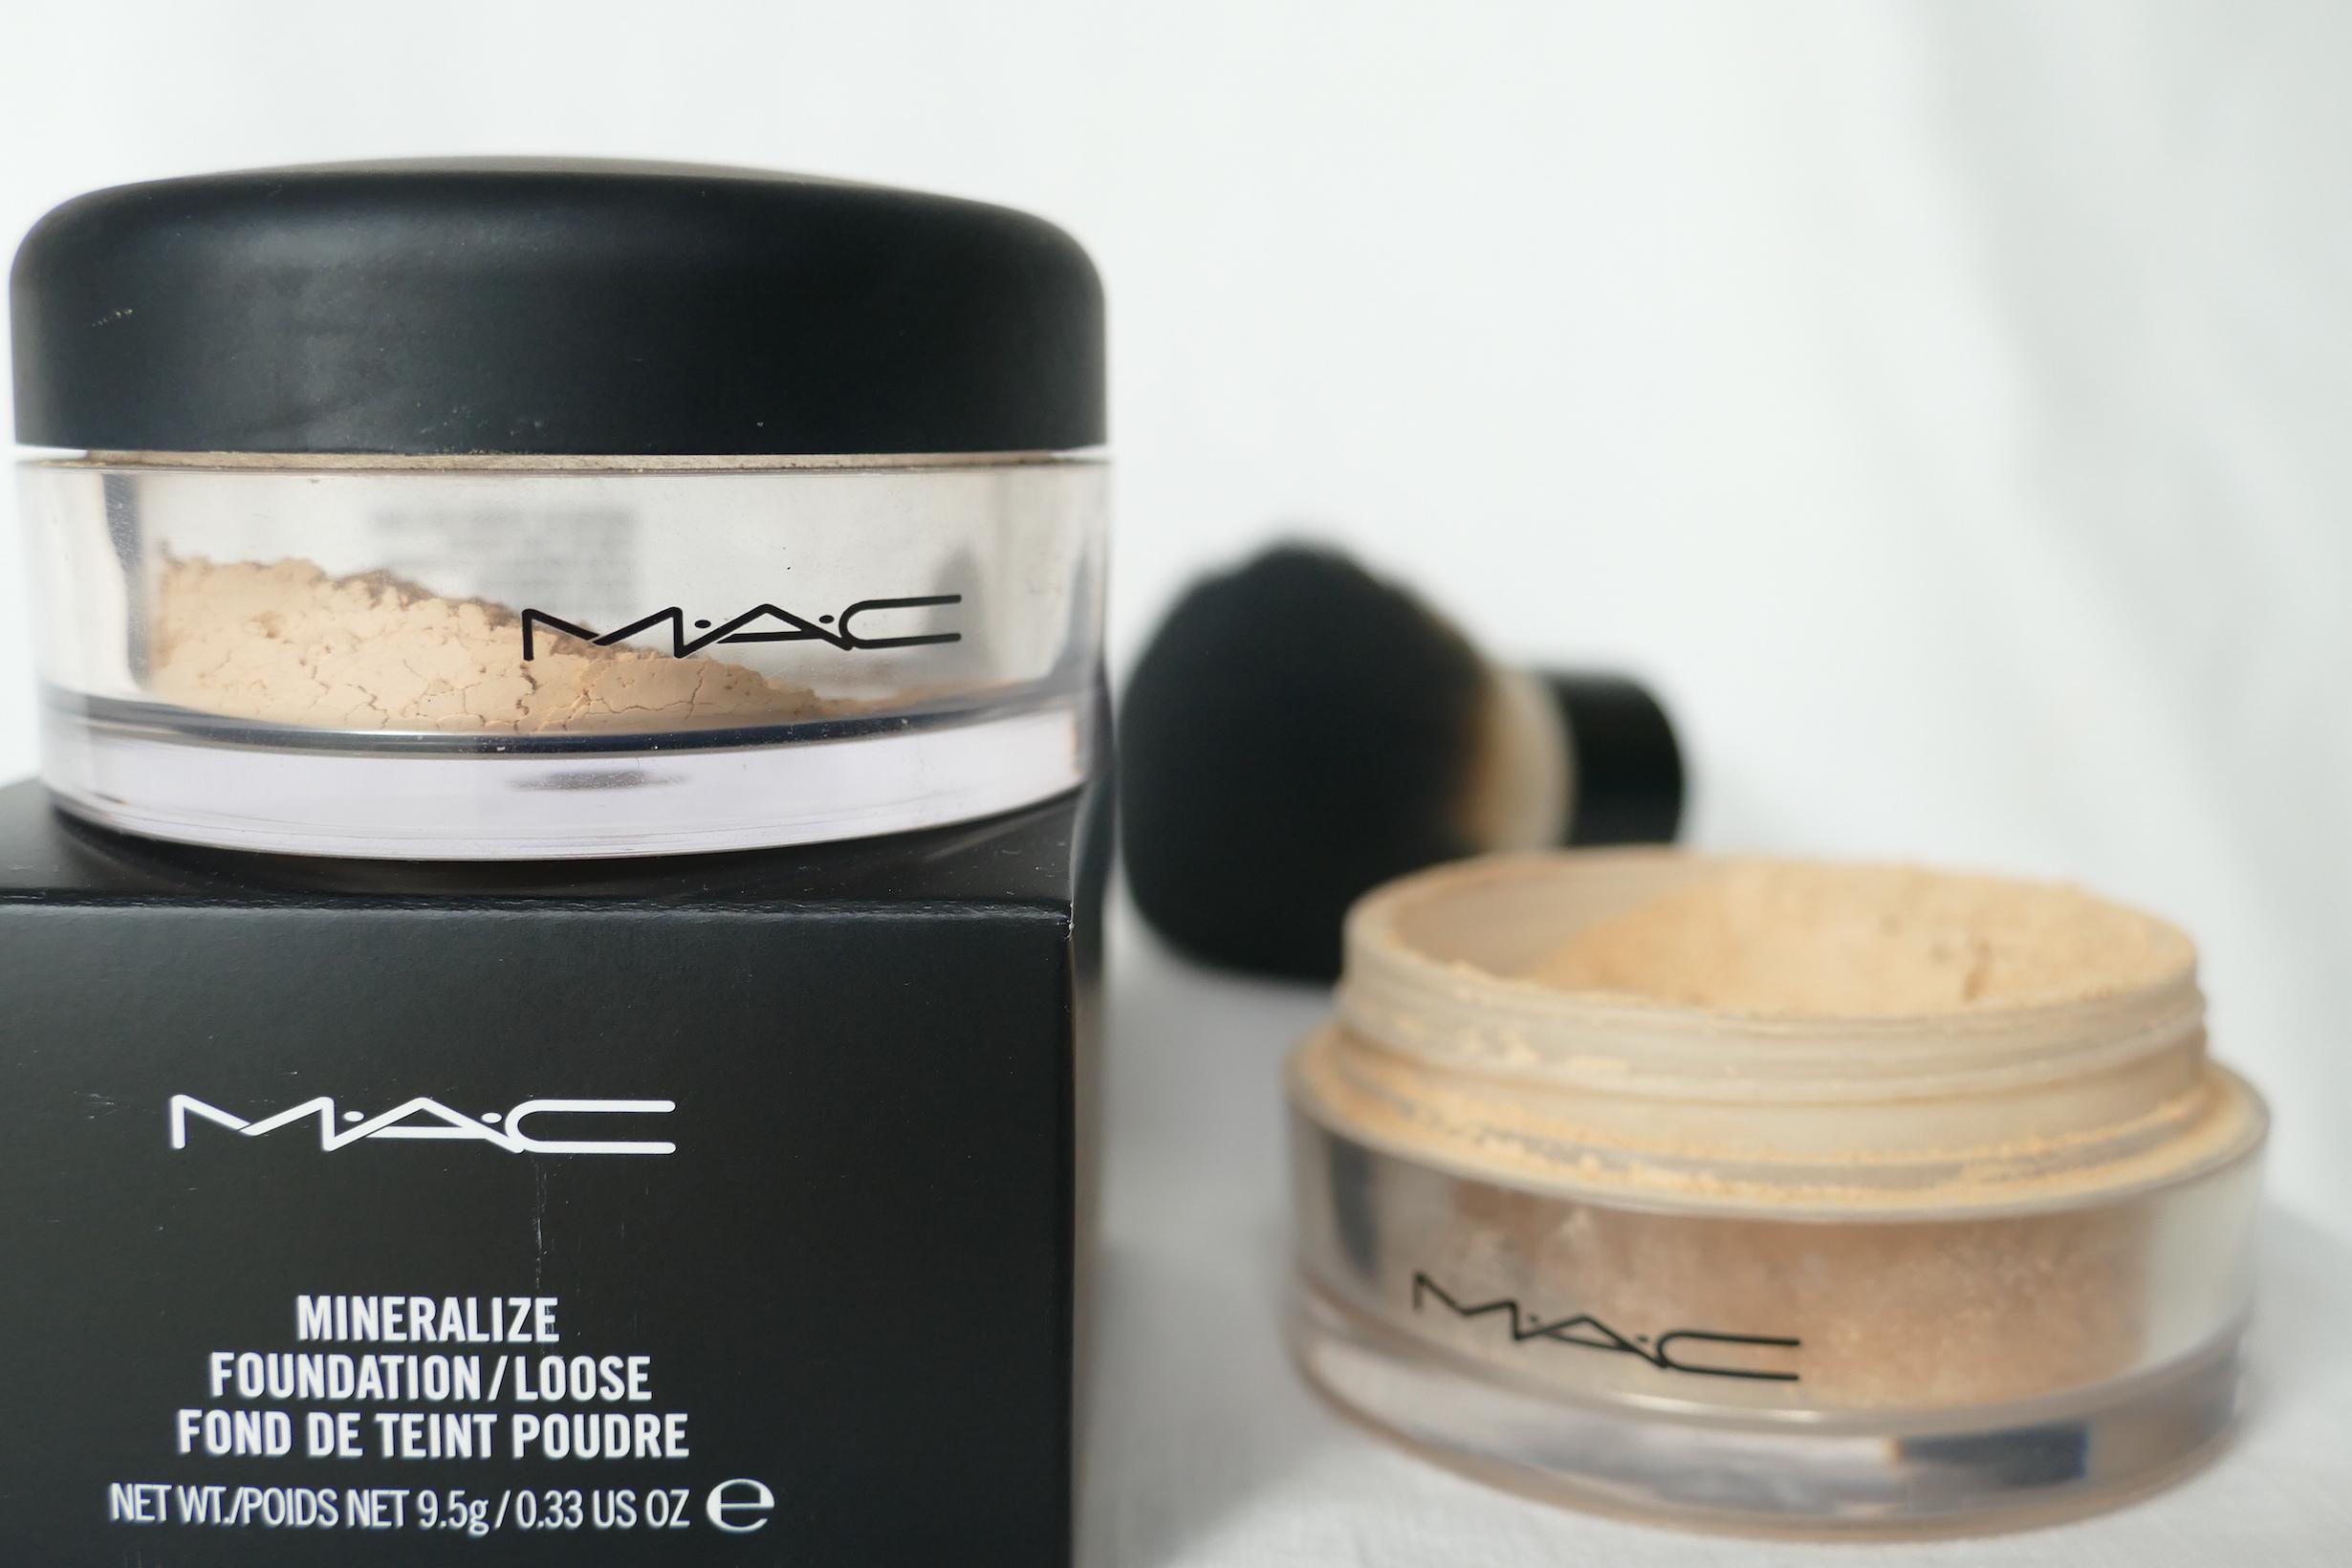 MAC discontinues their best summer foundation – heeeeeeelp